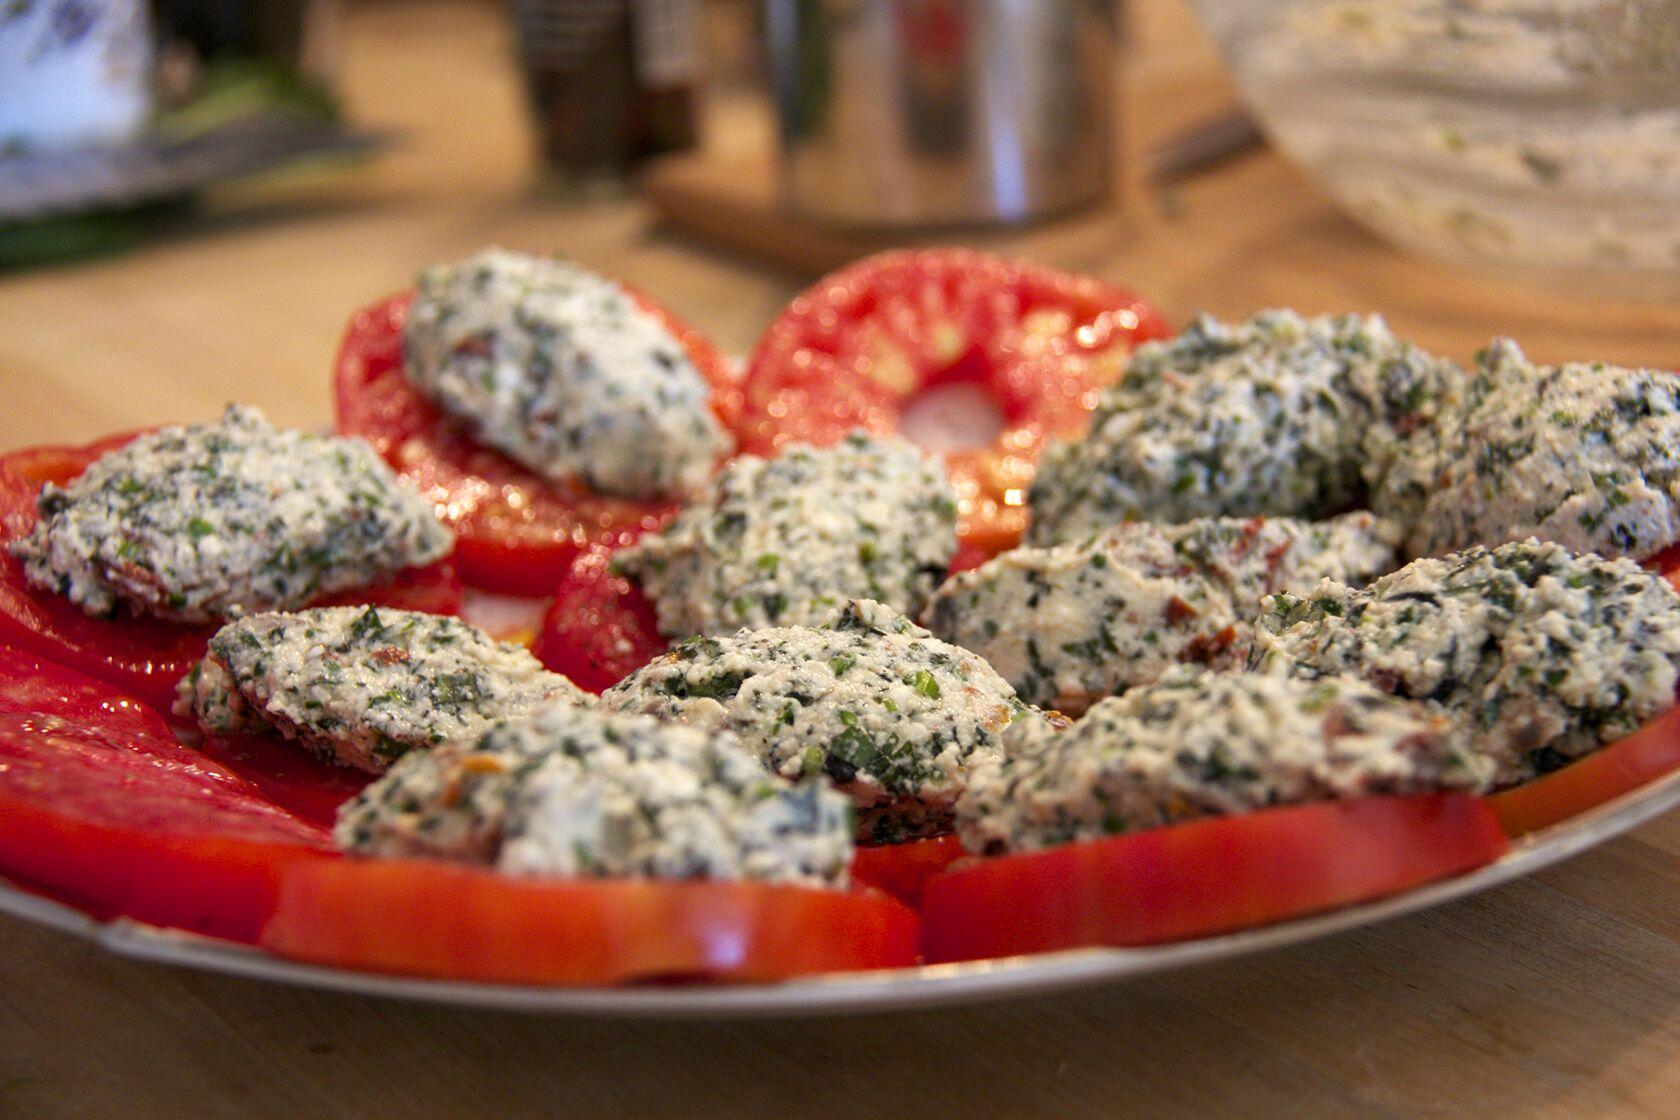 Tomatoes with Bruccio quenelles